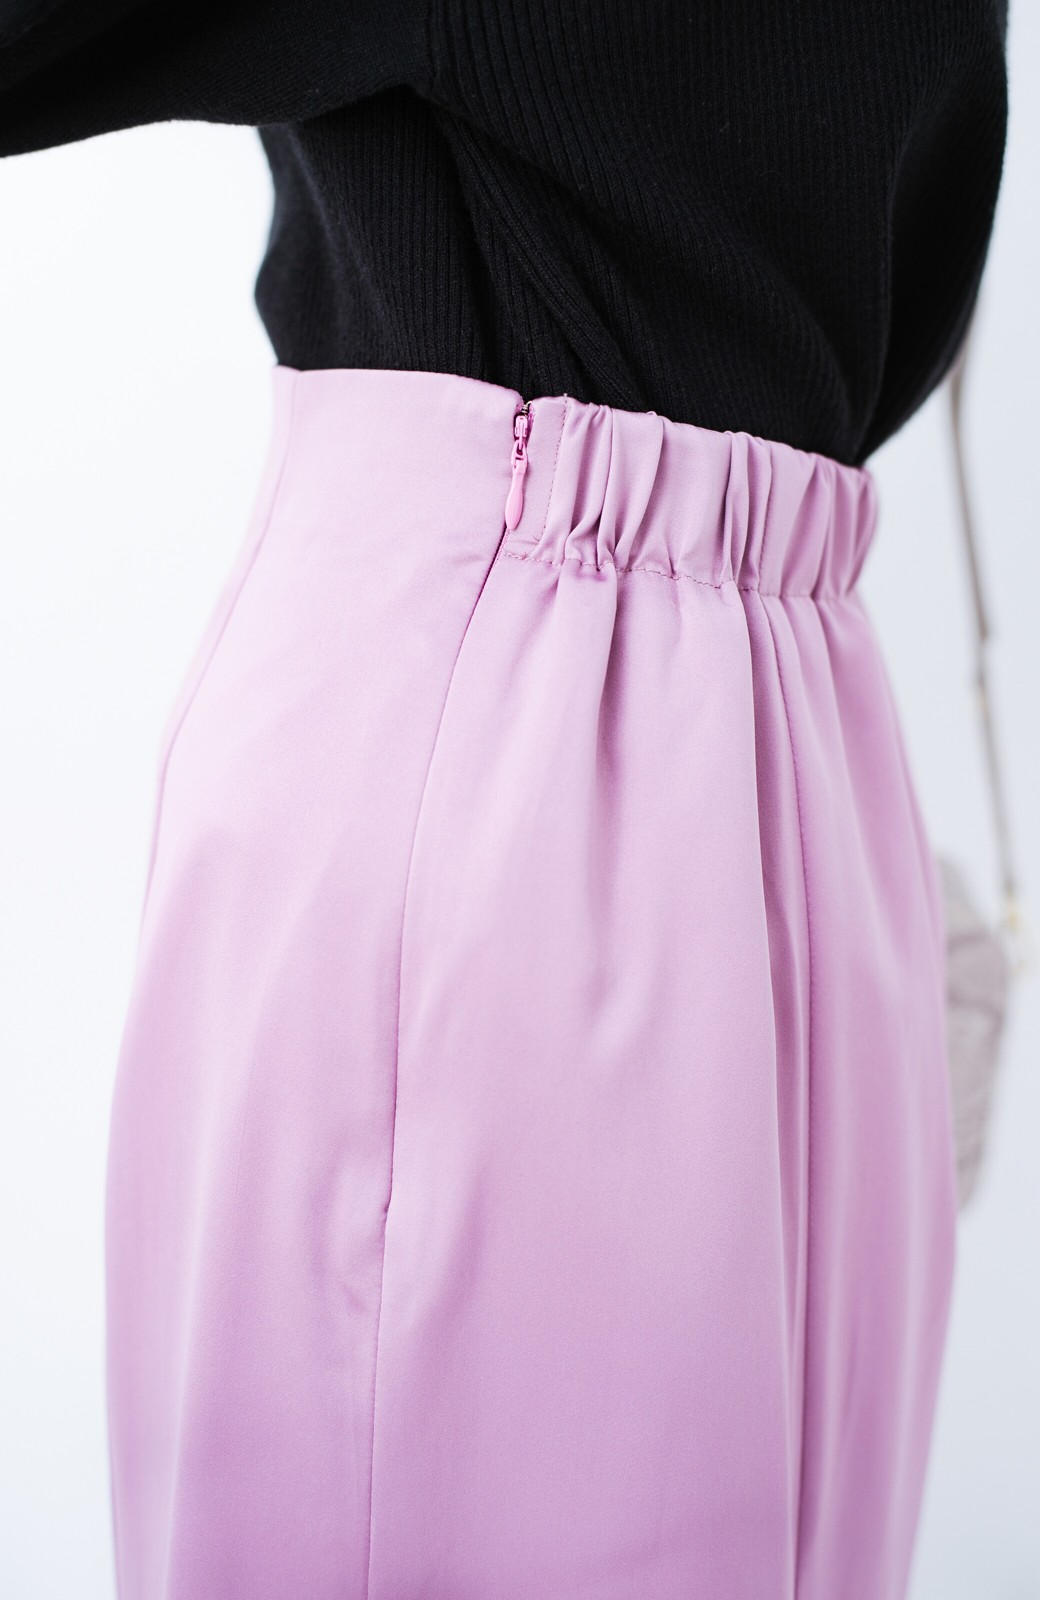 haco! スウェットやスニーカーを合わせても女っぽくいられるサテンマーメイドスカート by que made me <ピンク>の商品写真8